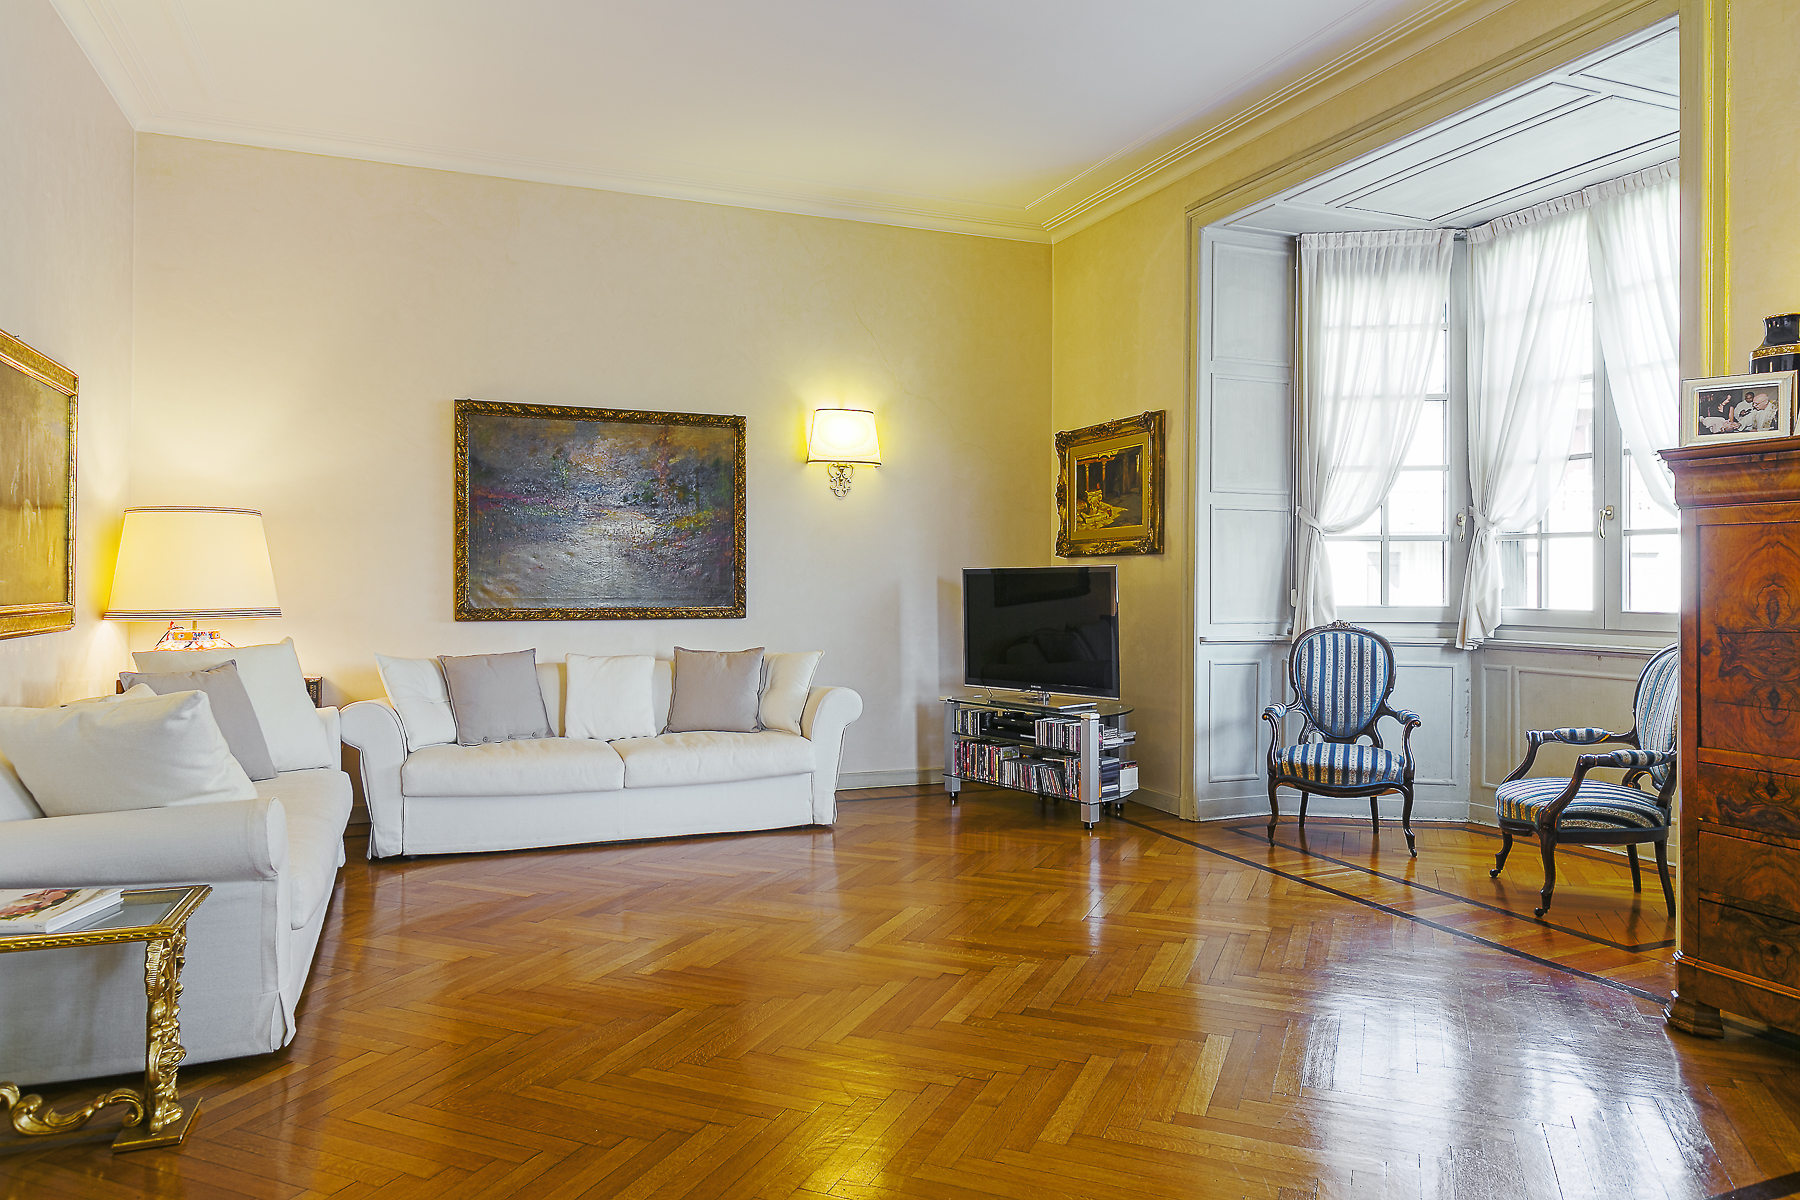 Apartment for Sale at Splendid apartament in a prestigious building via Cadamosto Milano, Milan 20129 Italy